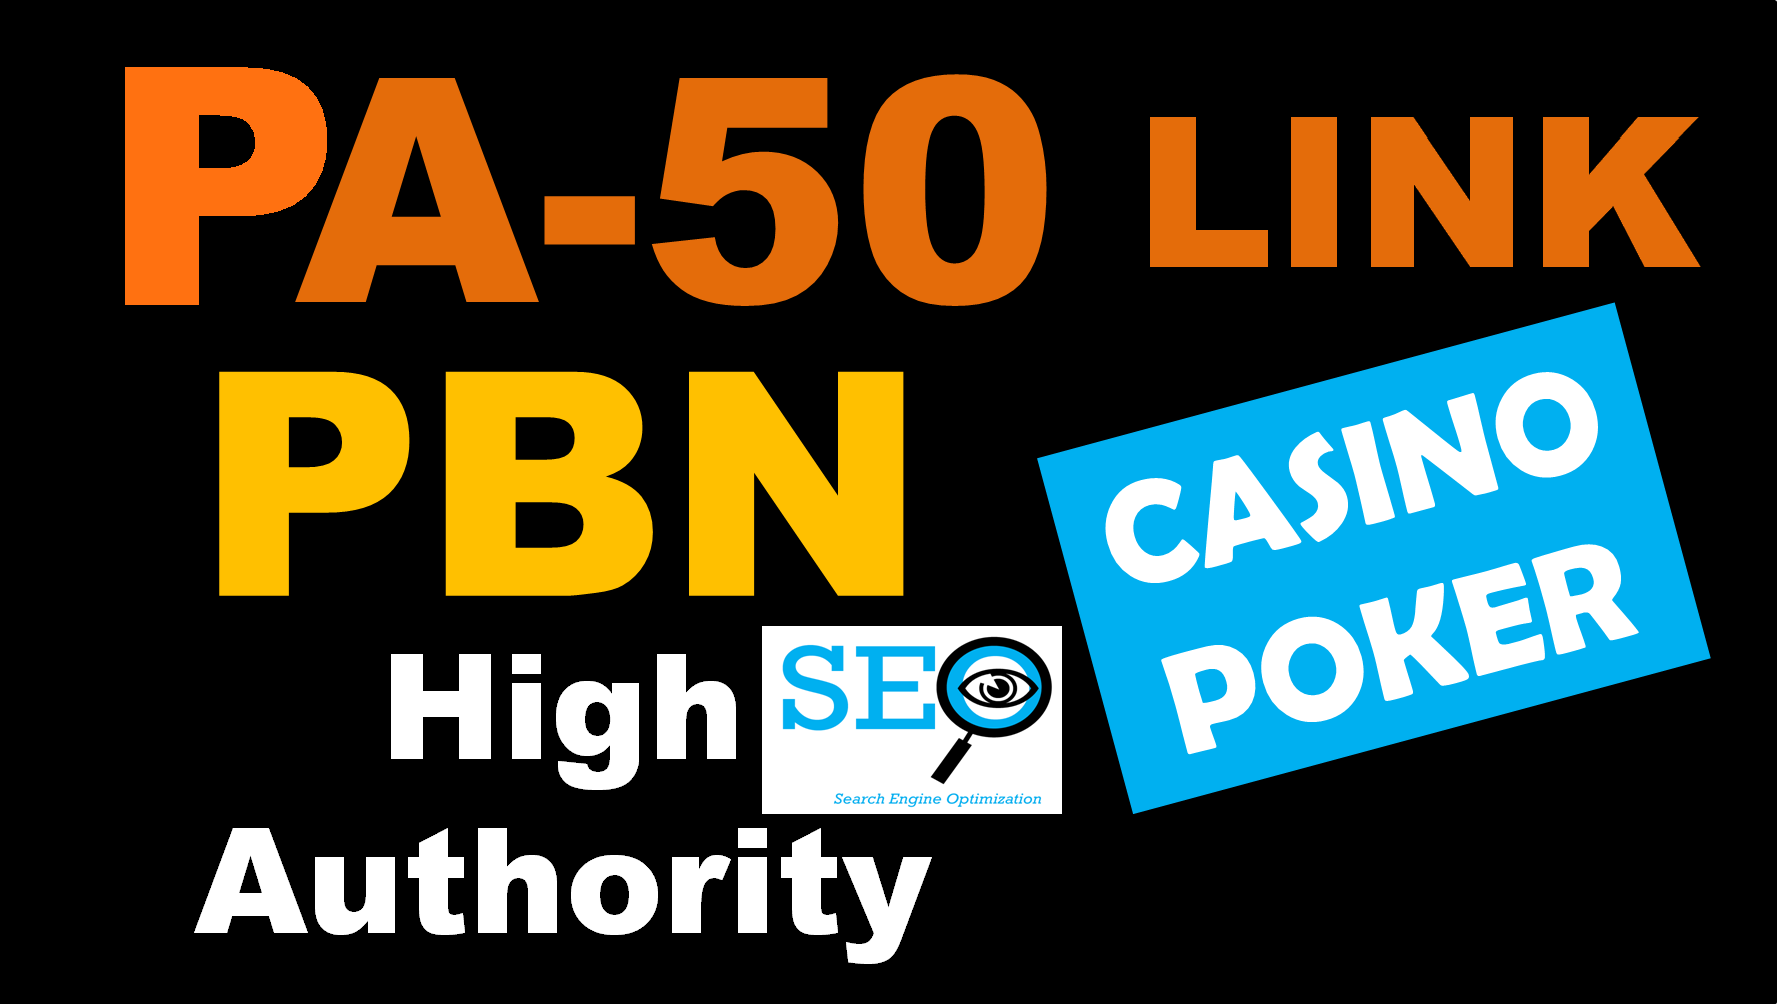 PBN PA 50 High Authority Backlinks for Casino Poker & Gambling Websites